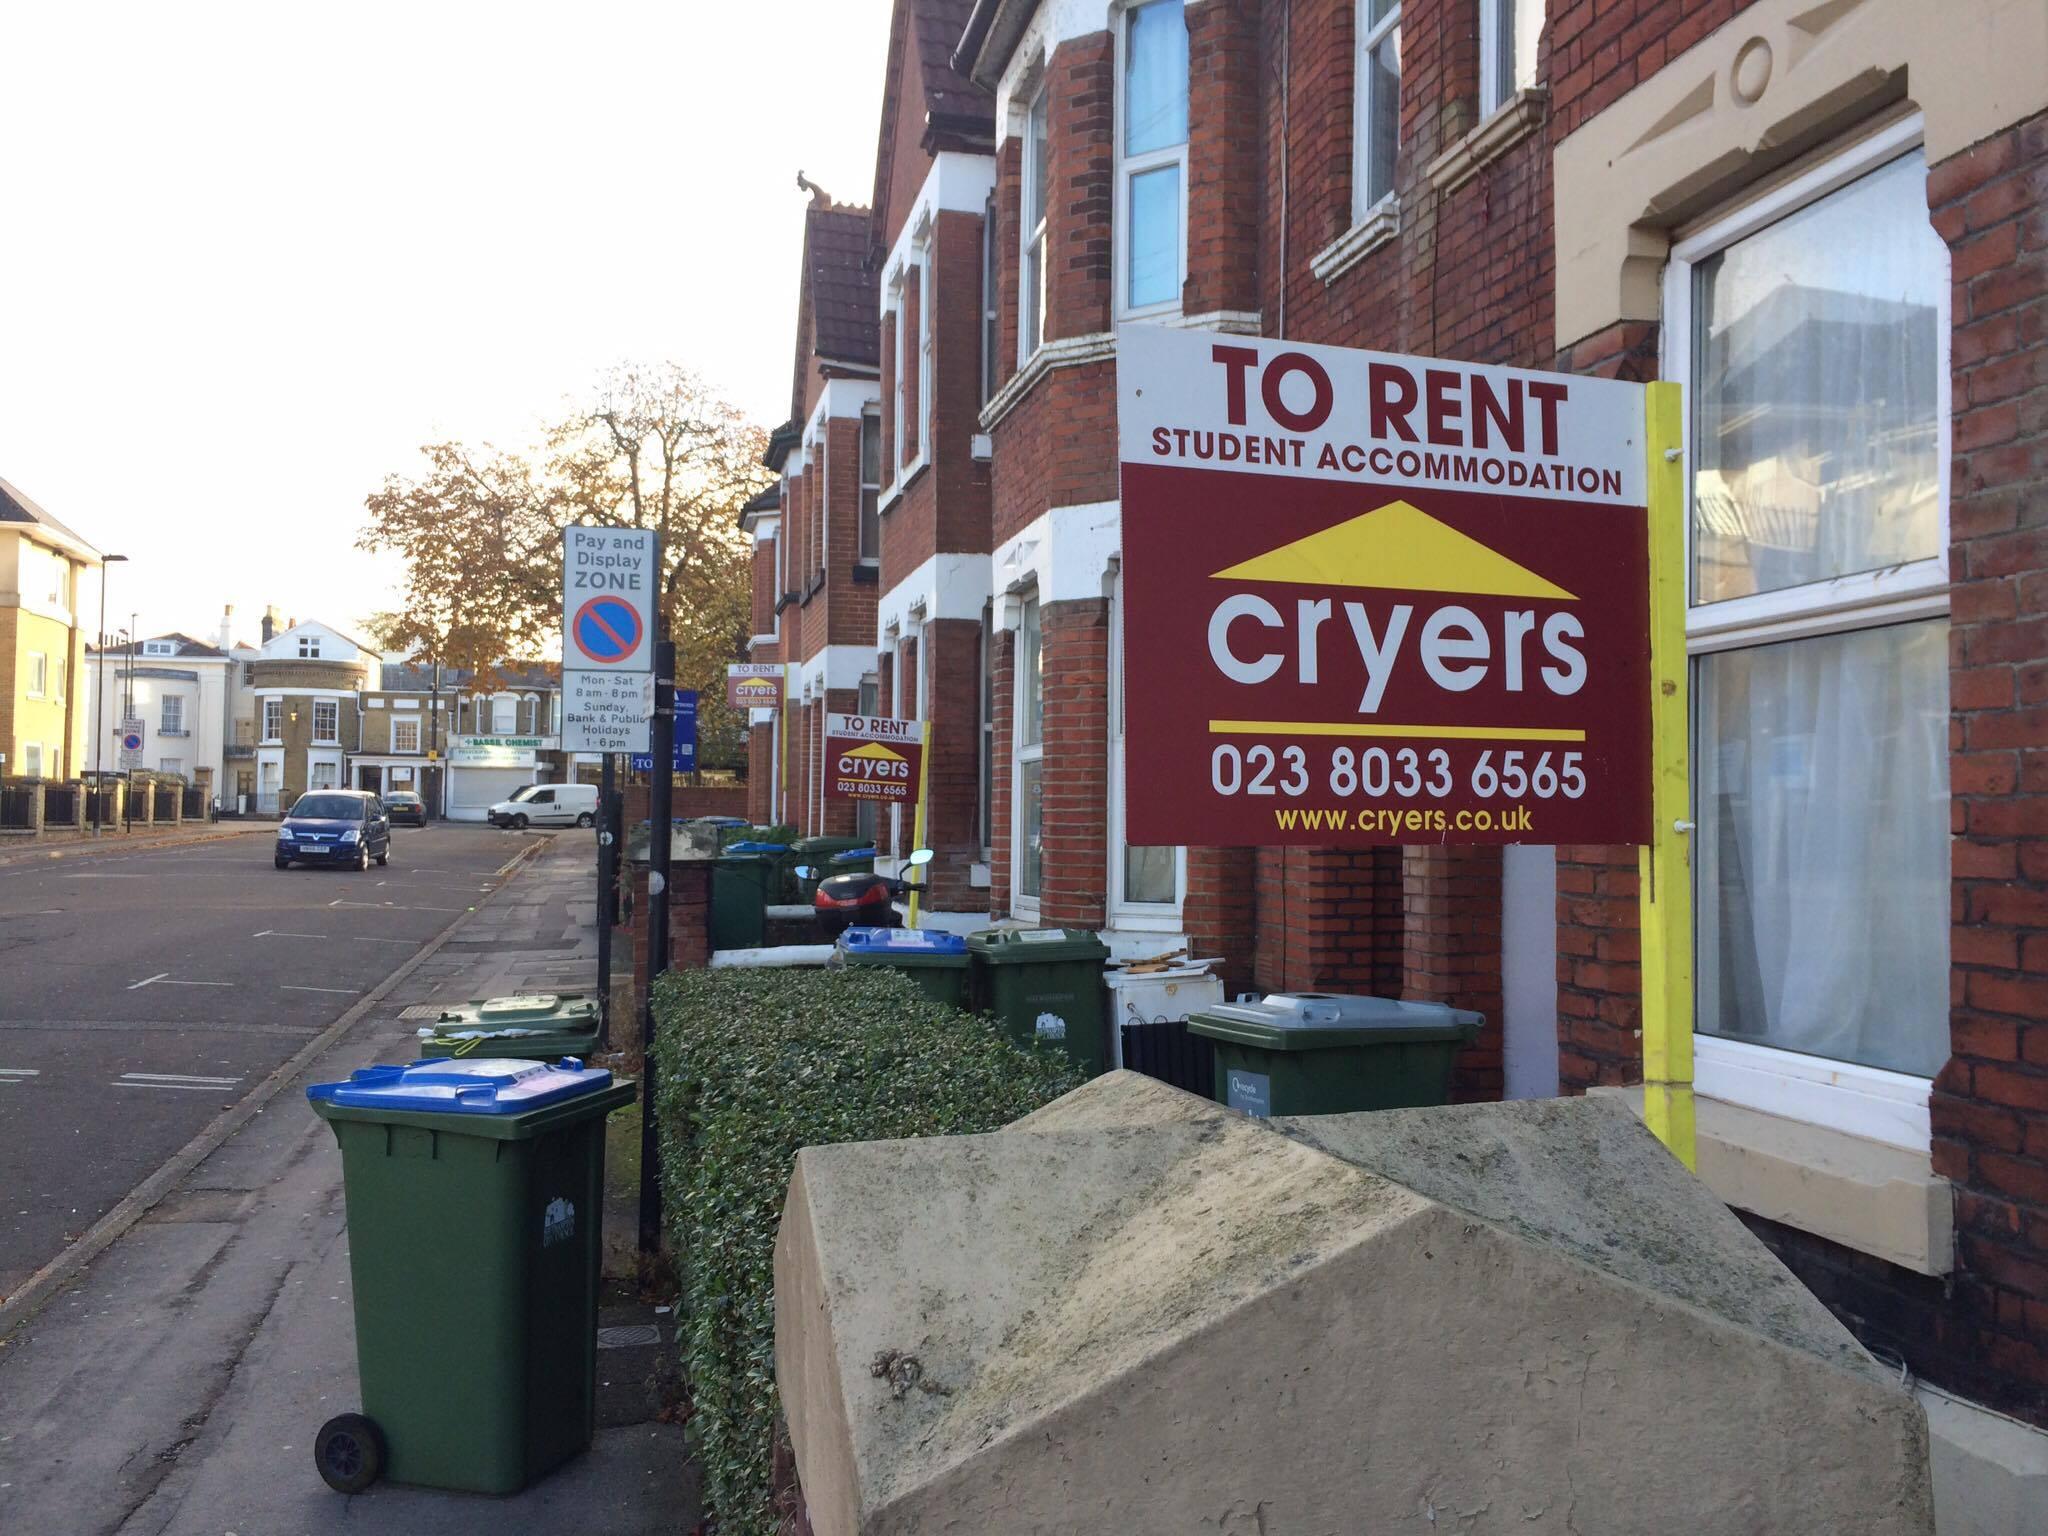 Students: High rent costs, slum landlords & shoddy accommodation